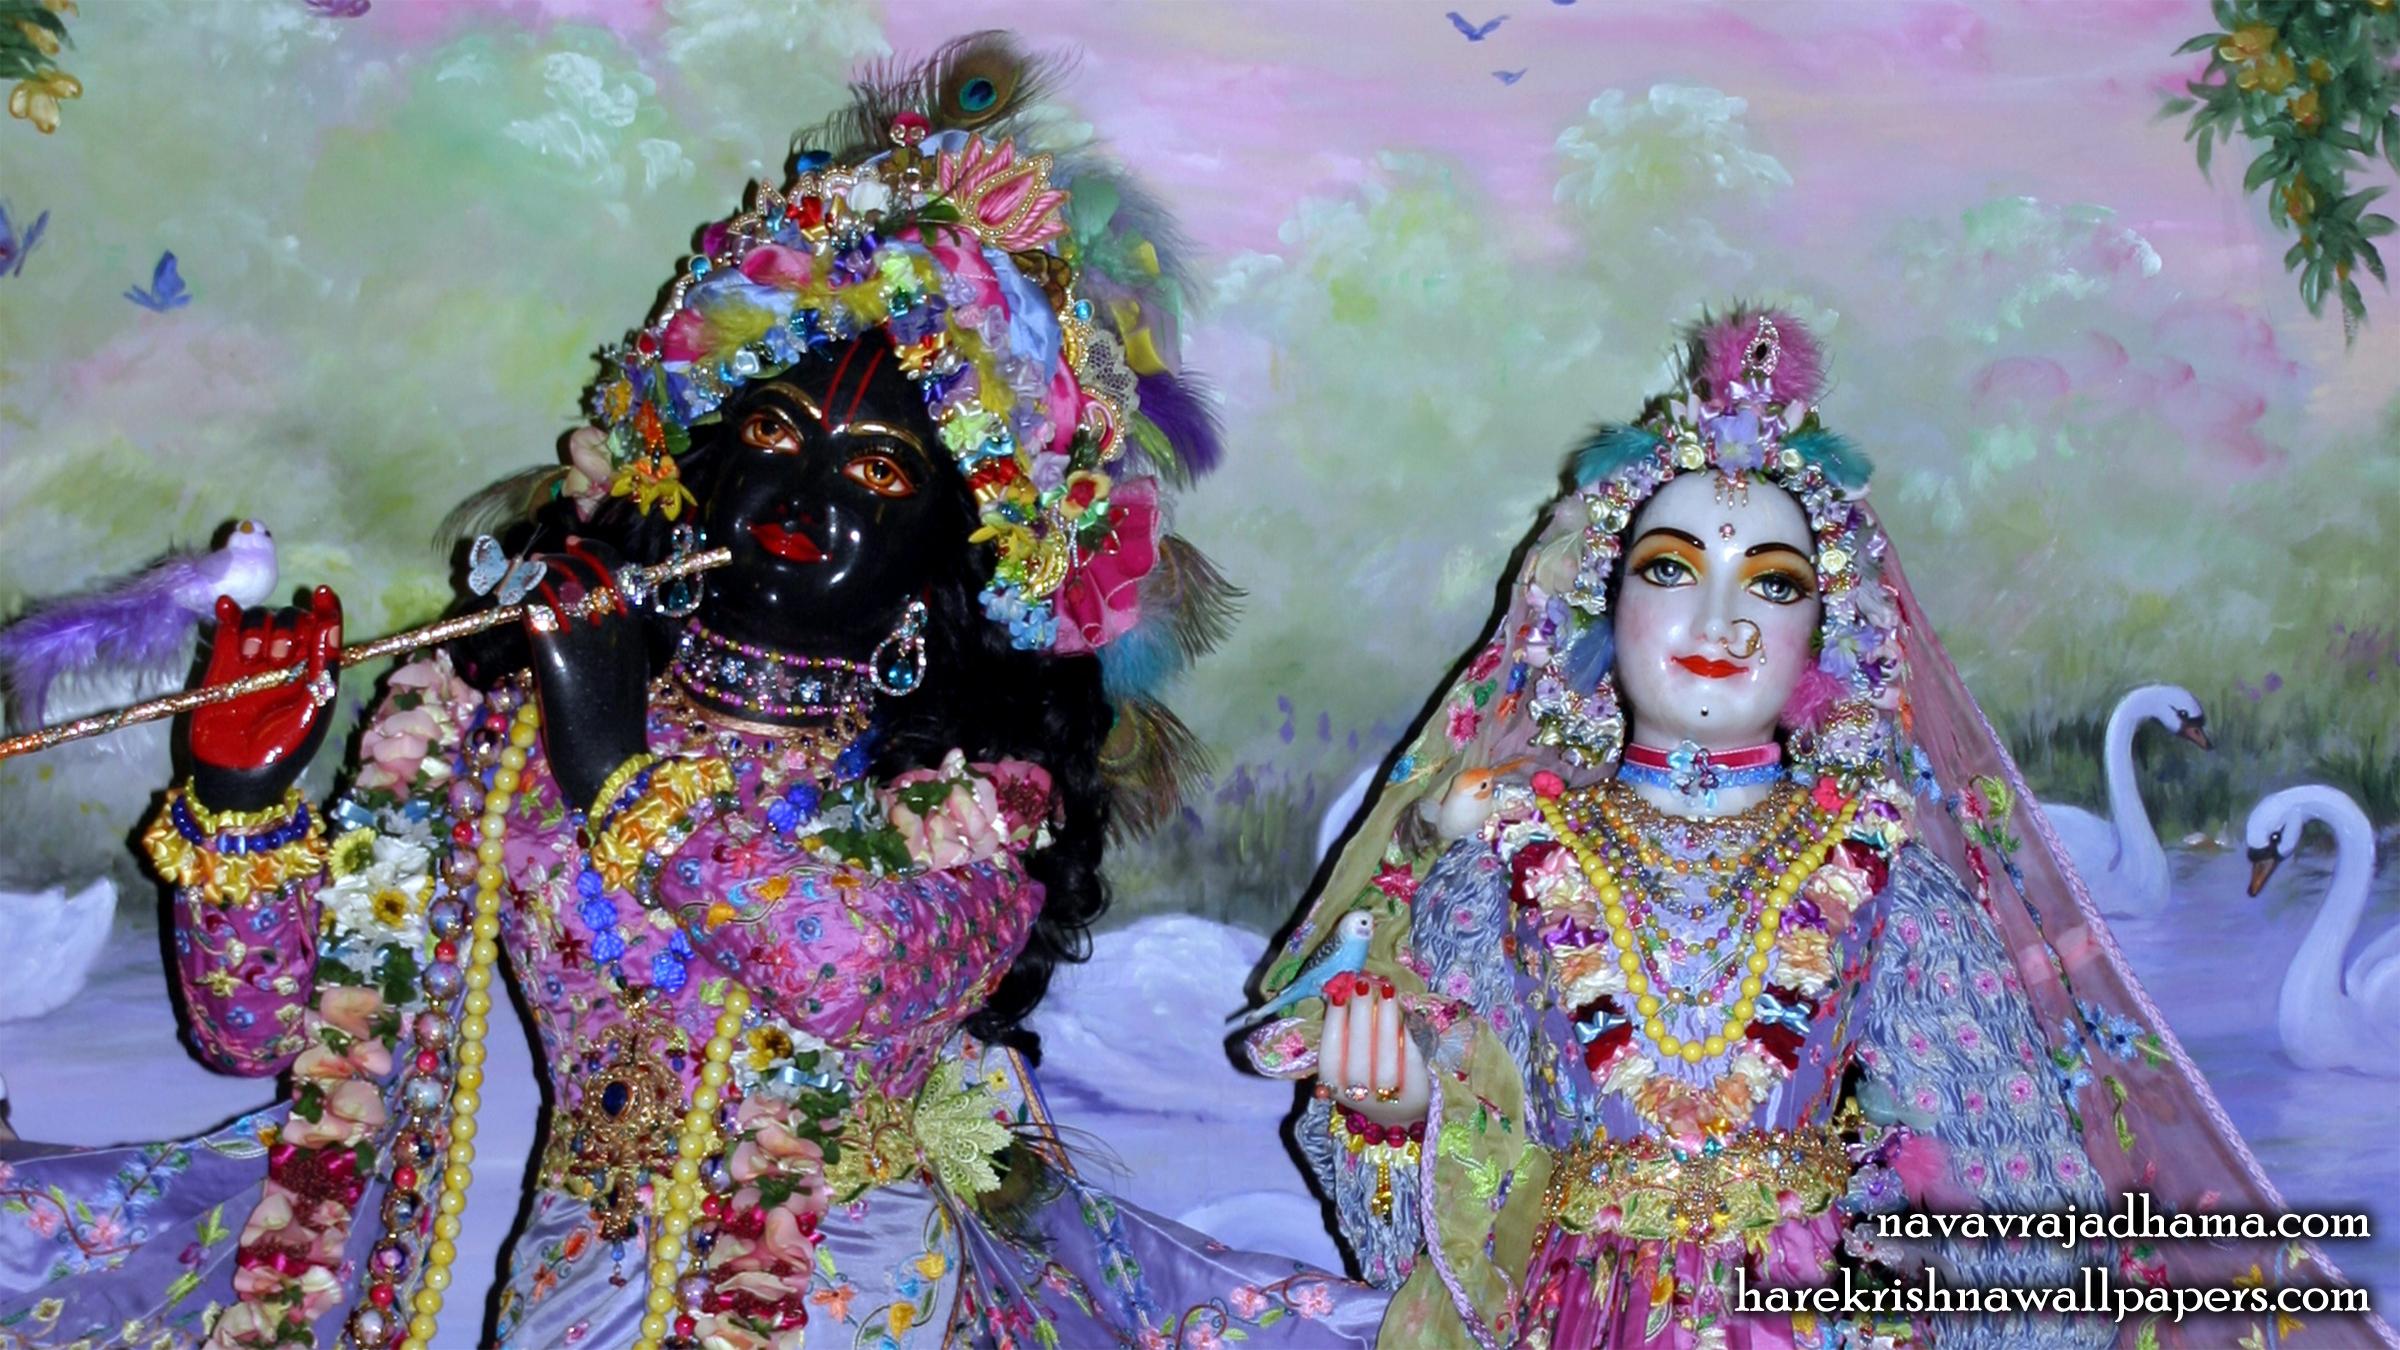 Sri Sri Radha Shyamsundar Close up Wallpaper (008) Size 2400x1350 Download